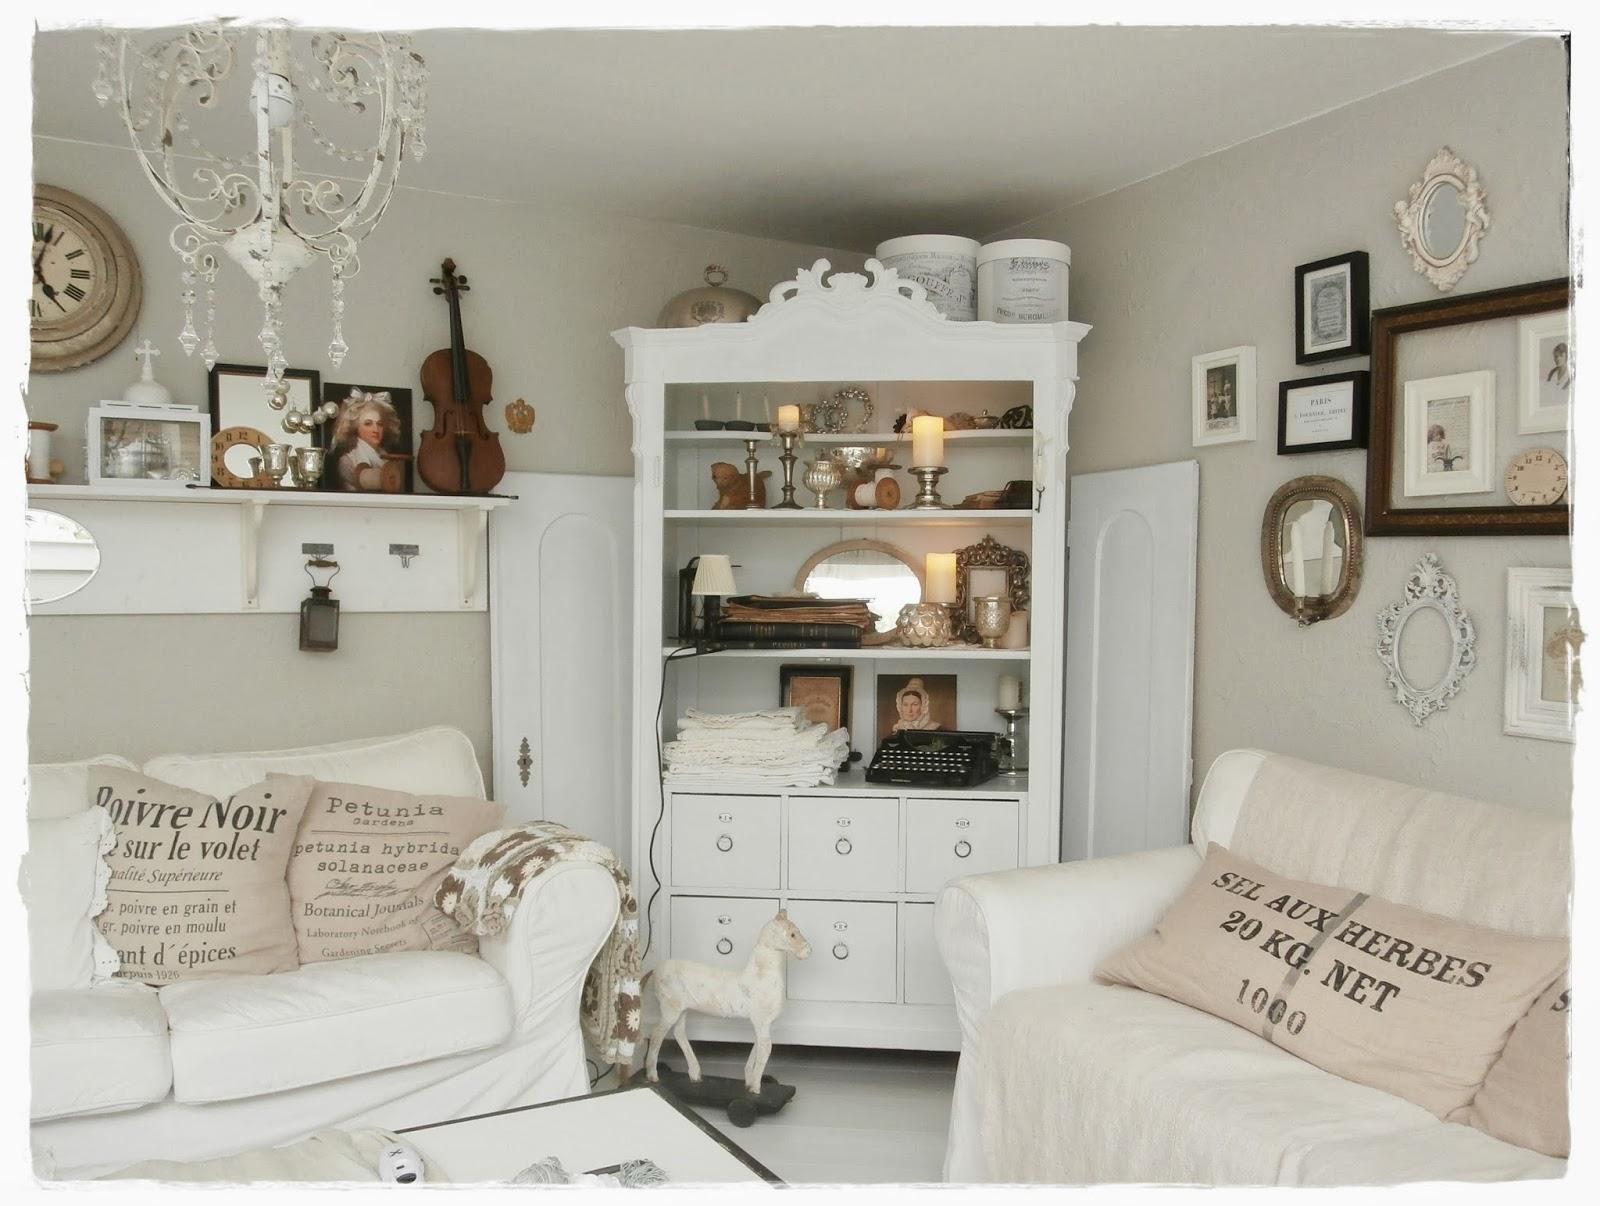 Elegant Landhausstil Farben Raumgestaltung Ideen